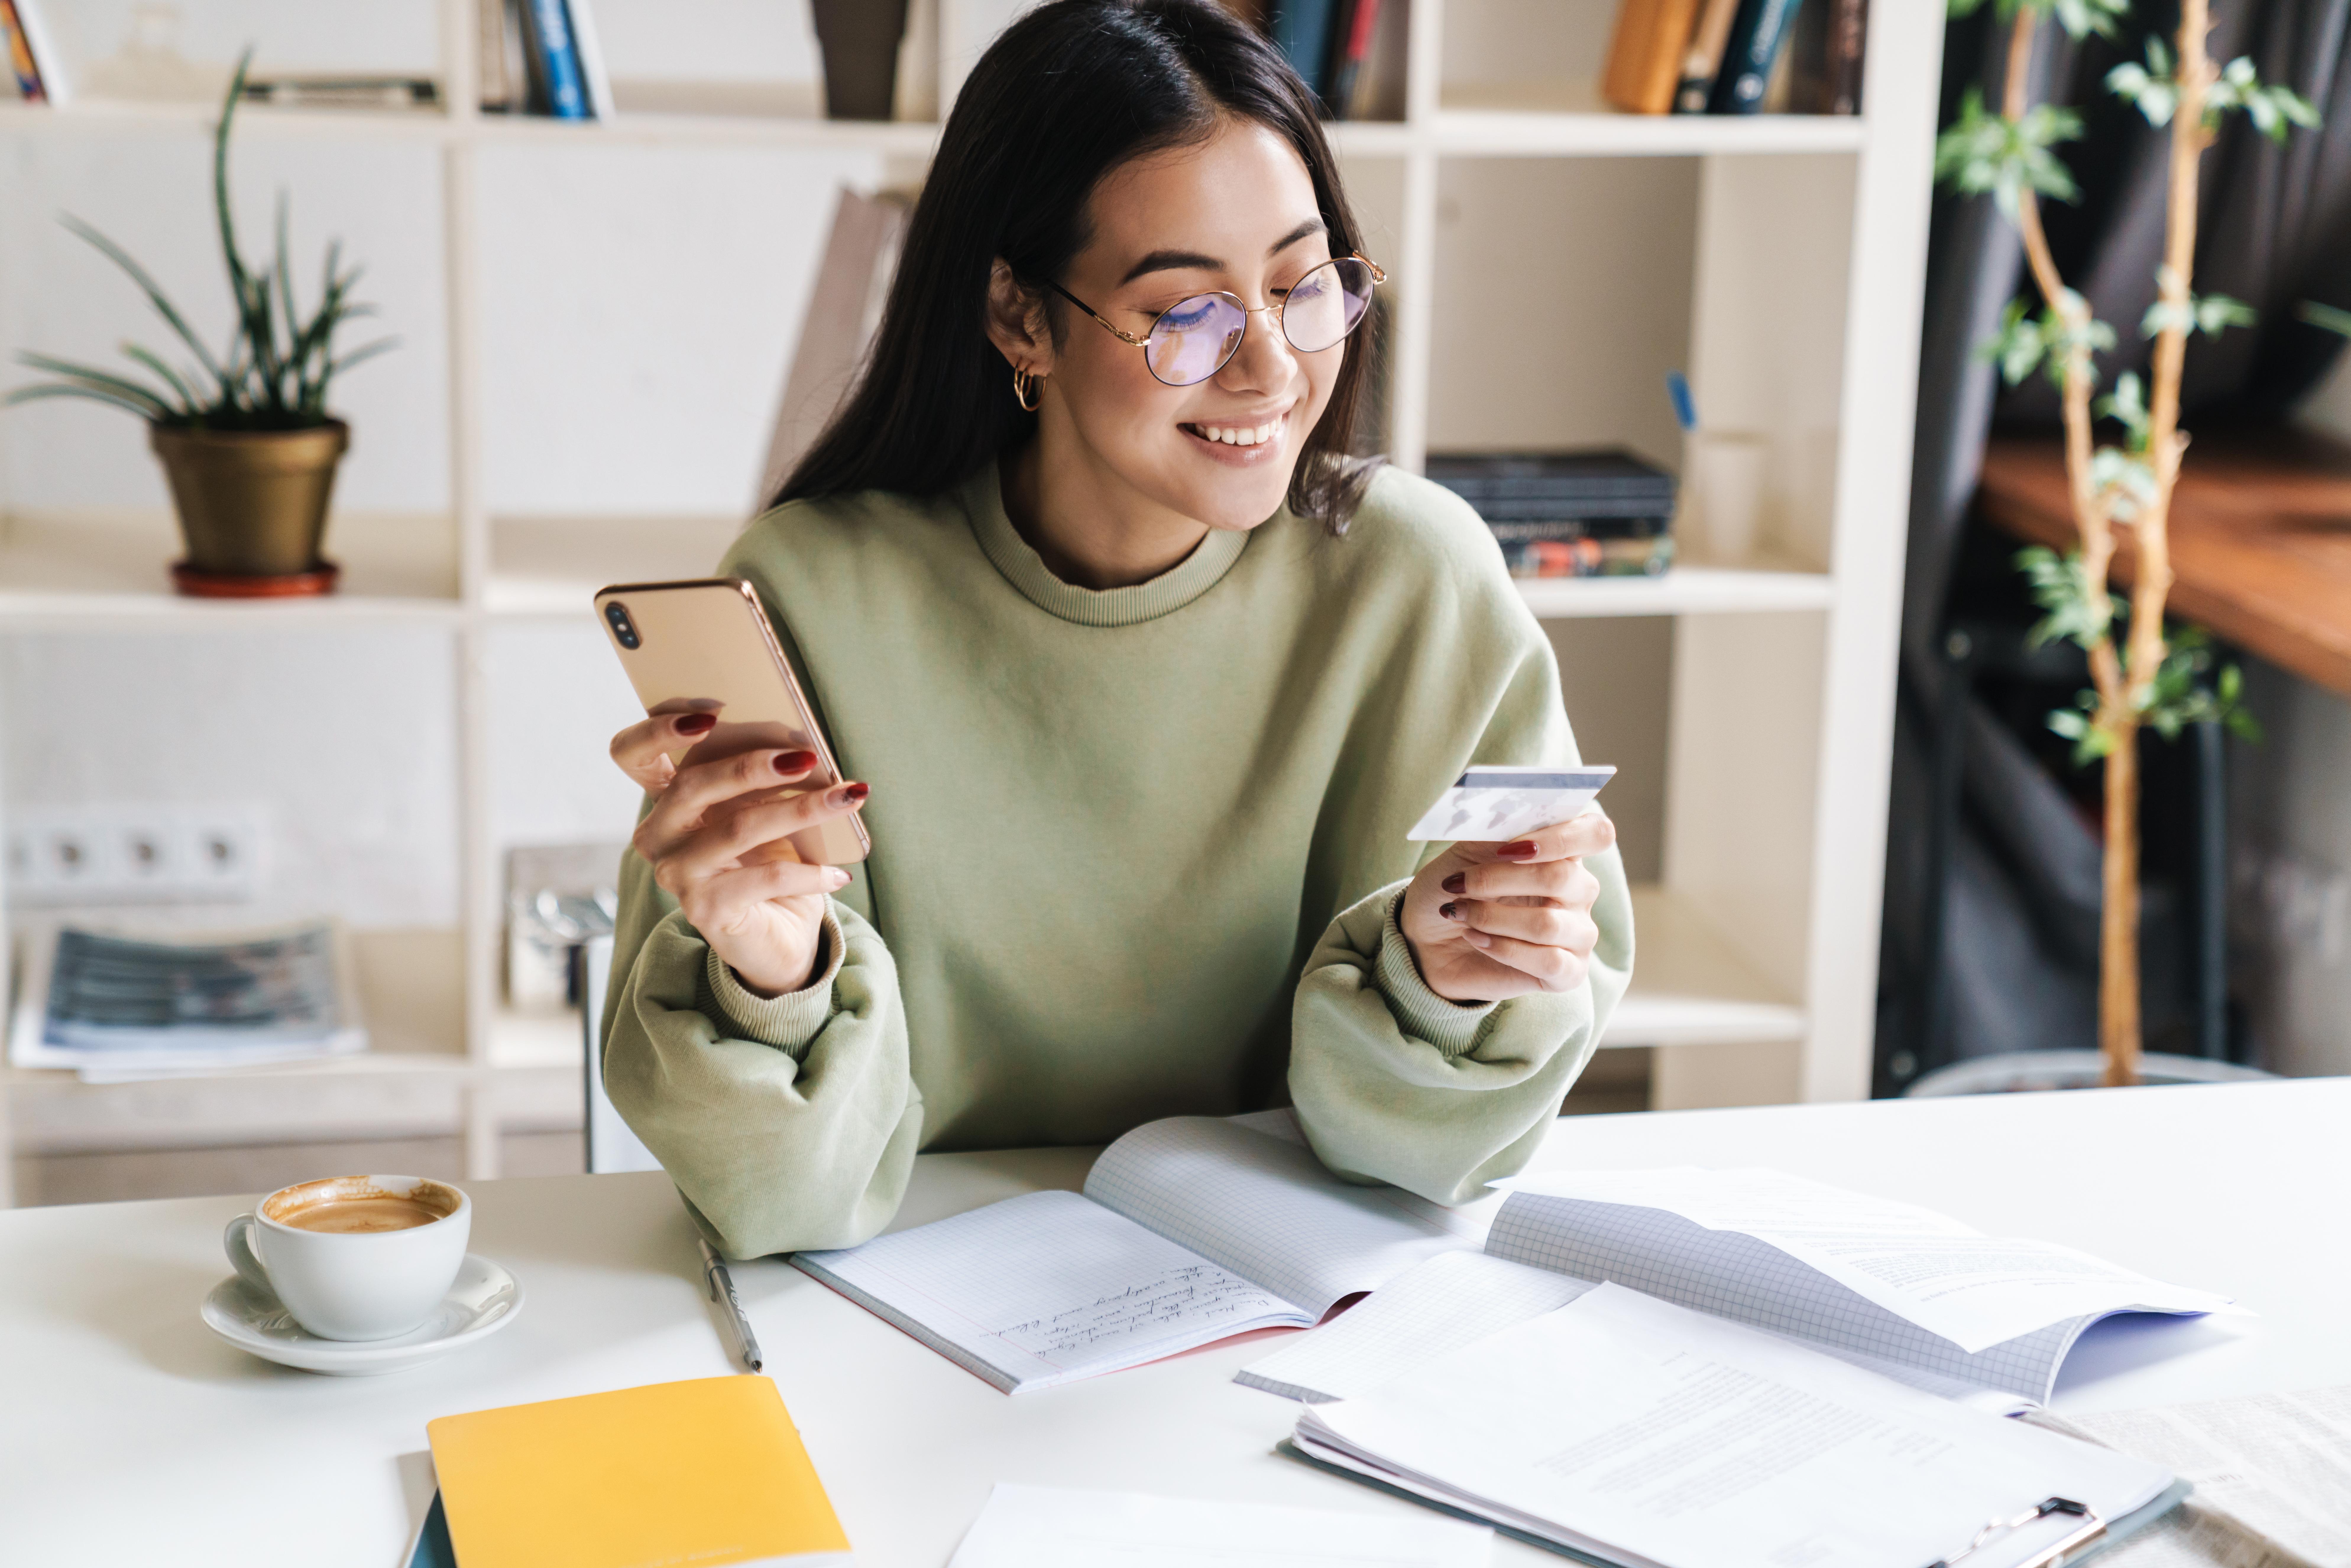 girl using phone and debit card